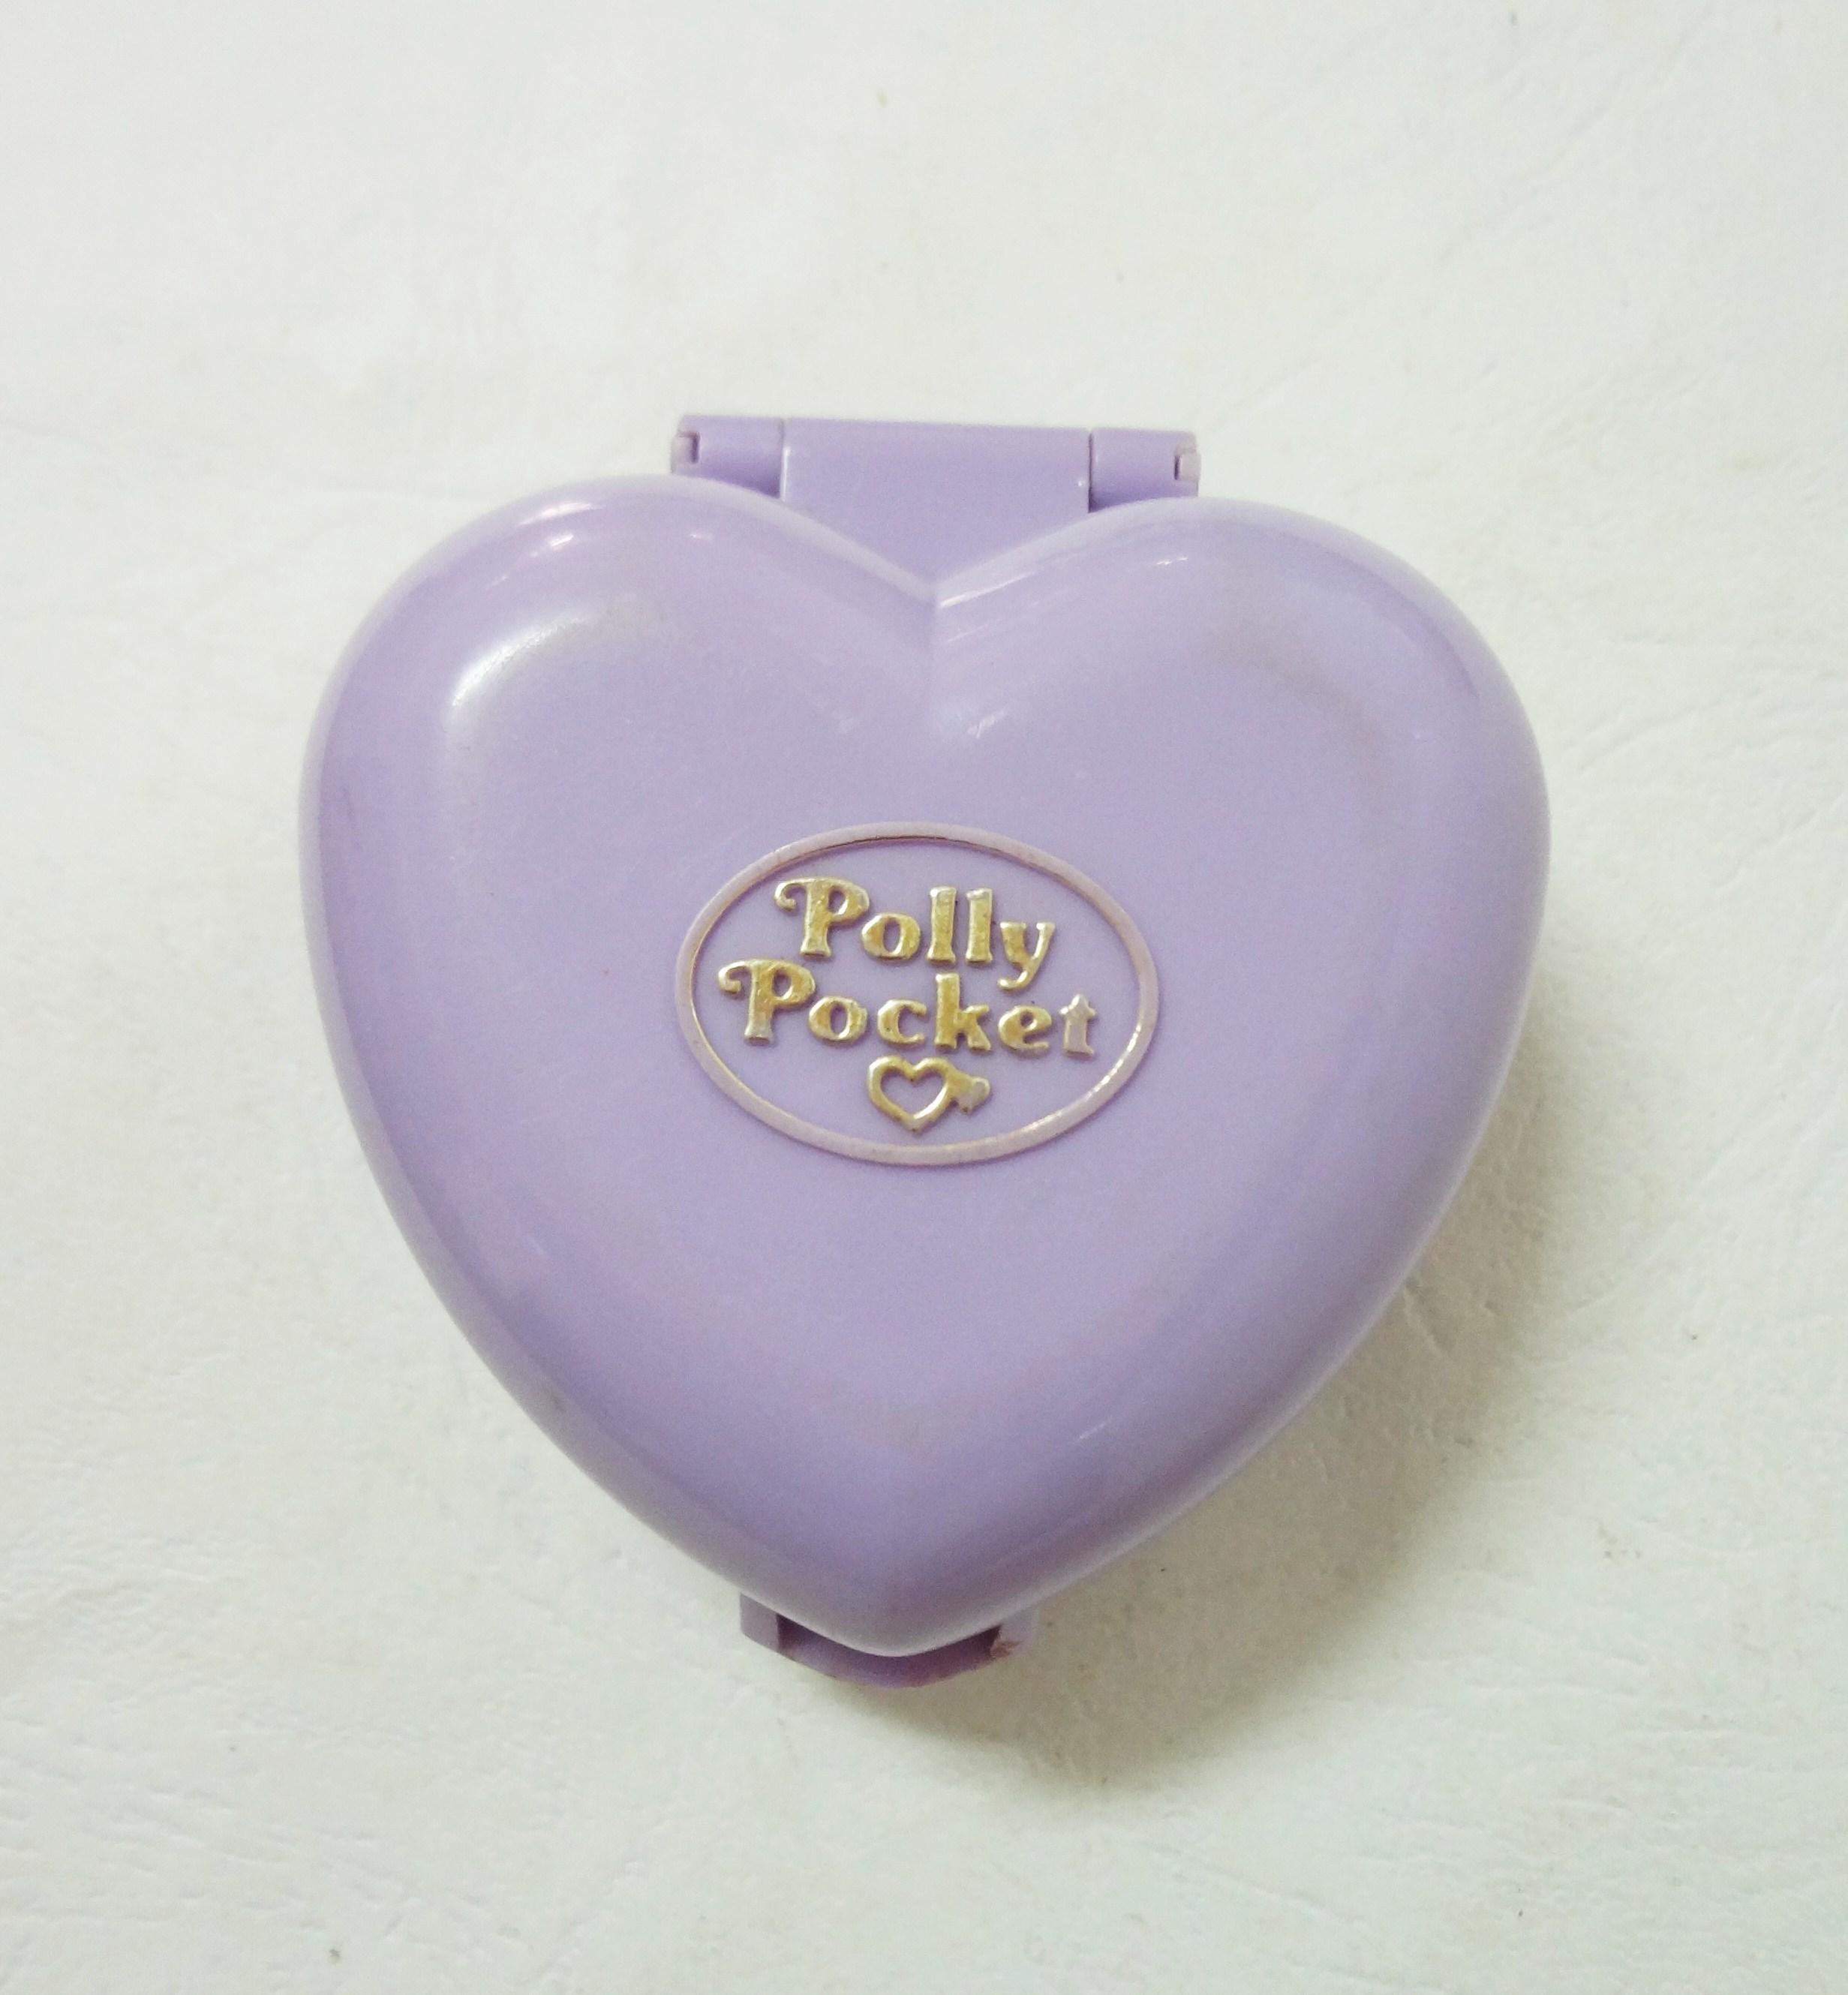 Polly Pocket Pretty Bunnies